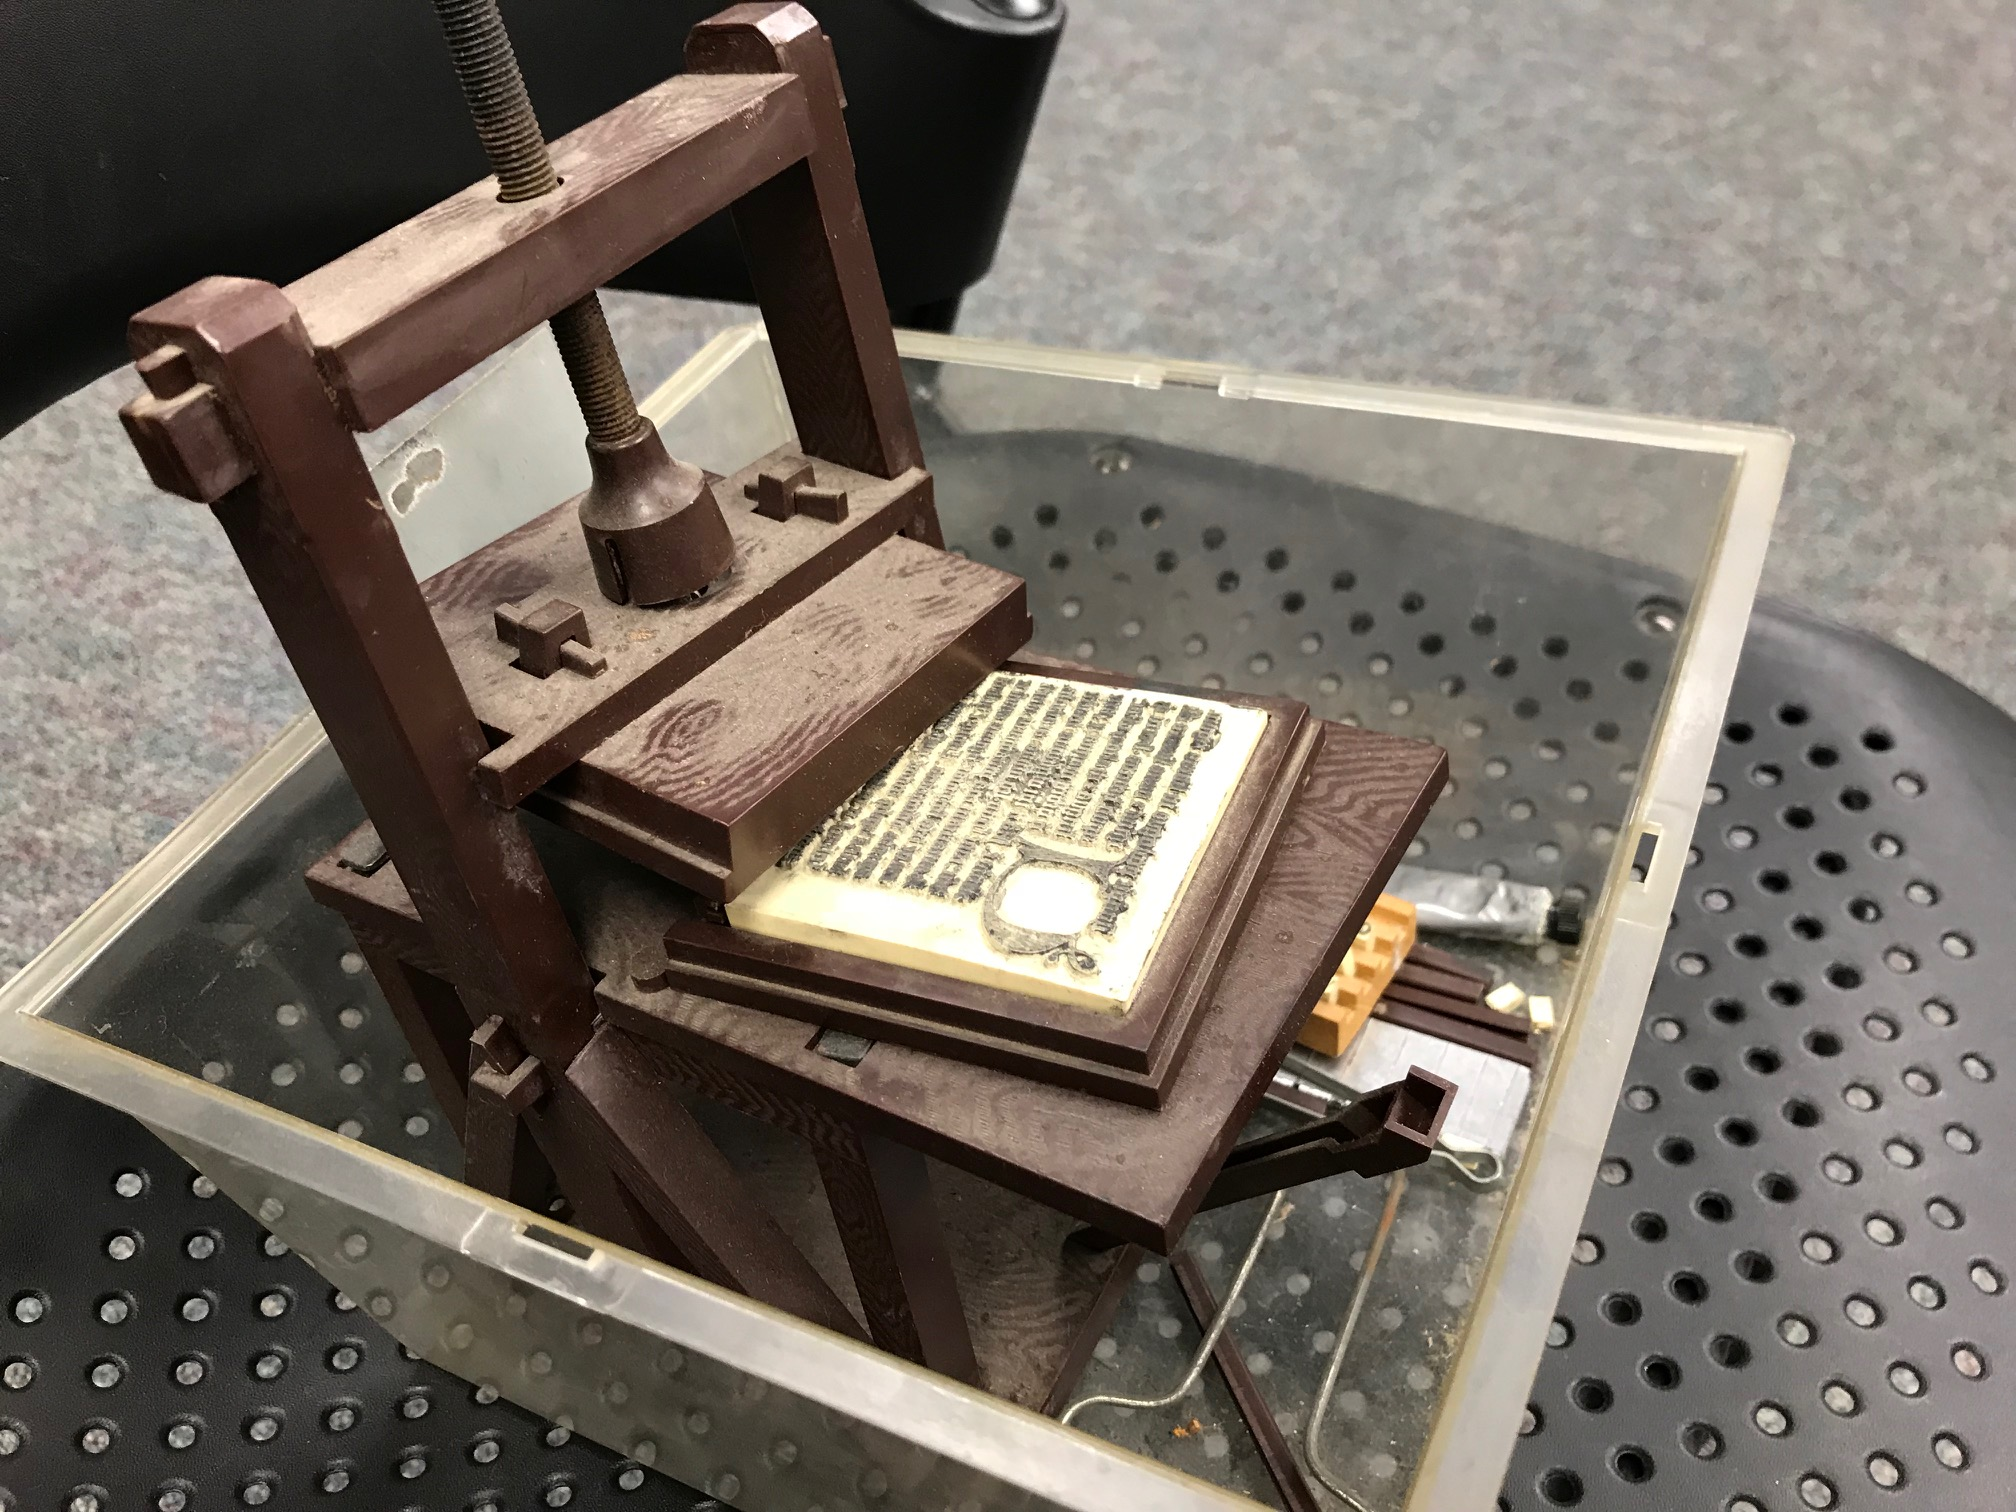 eh_toy_printing_press1_ann_warren